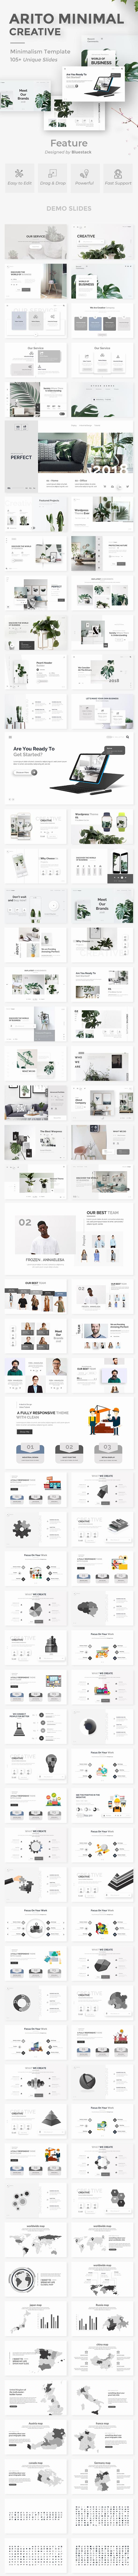 Arito Minimal Design Keynote Template - Creative Keynote Templates